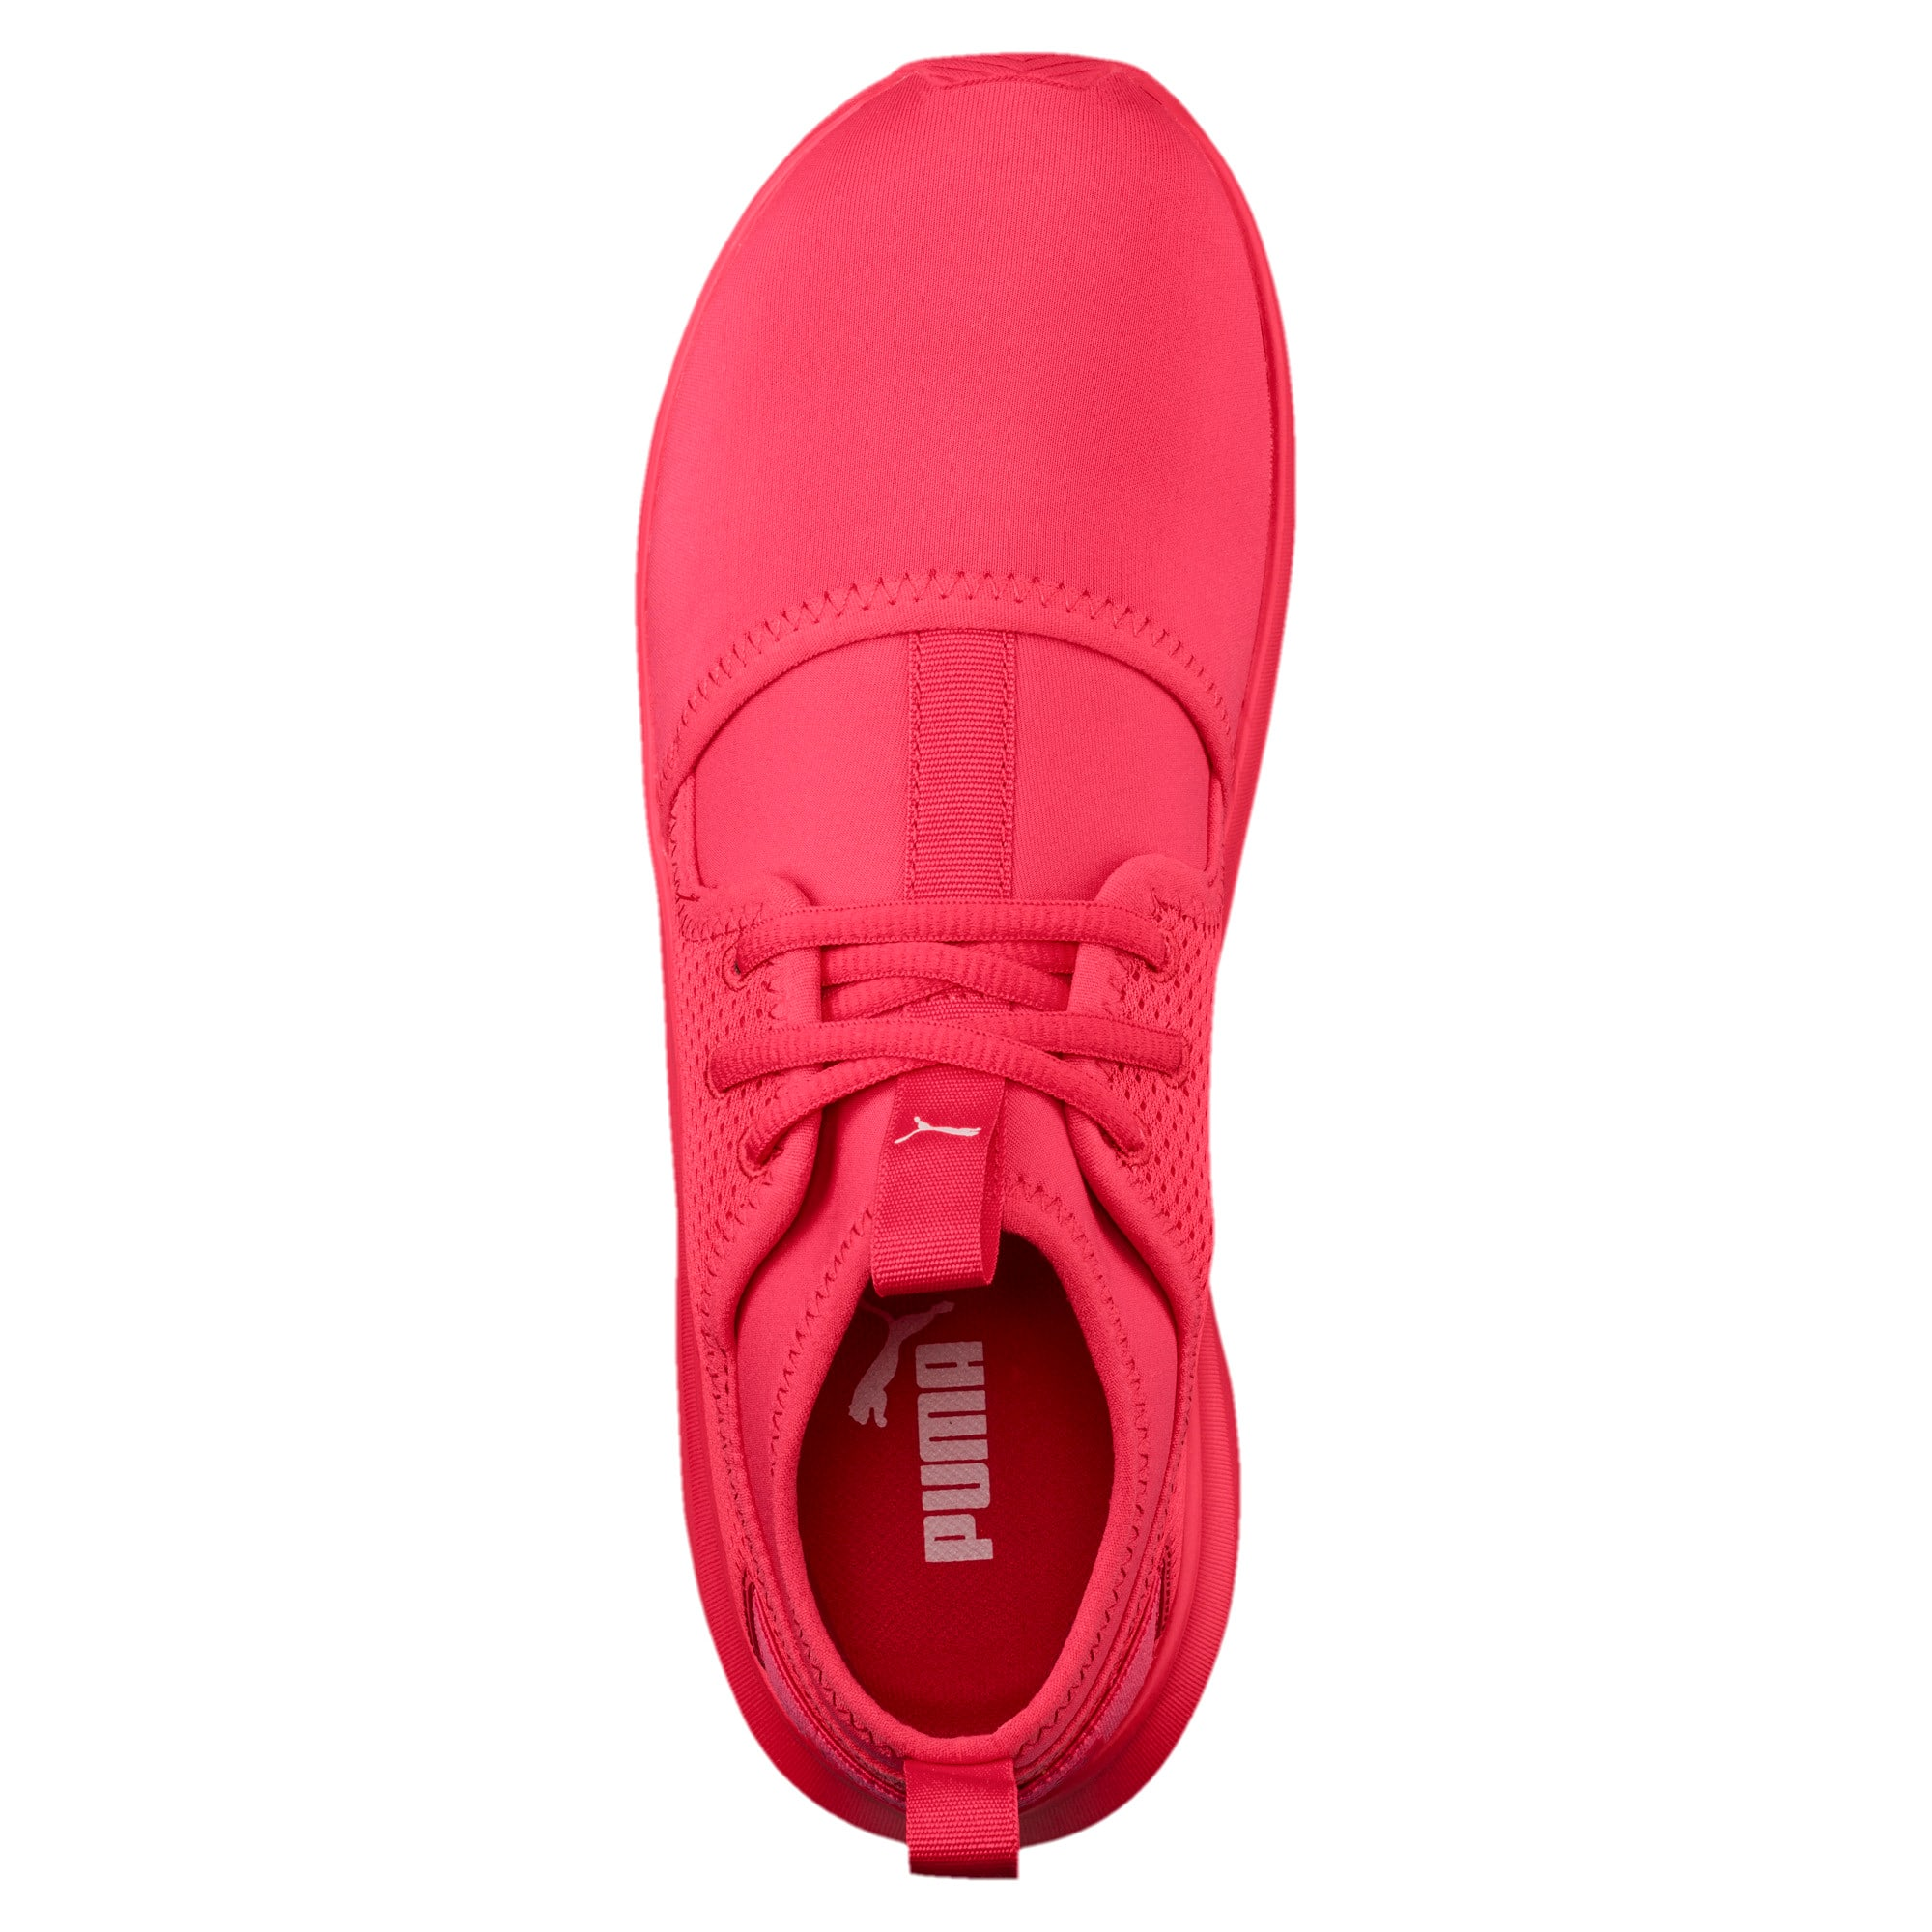 Thumbnail 5 of Phenom Lo Women's Training Shoes, Paradise Pink-Paradise Pink, medium